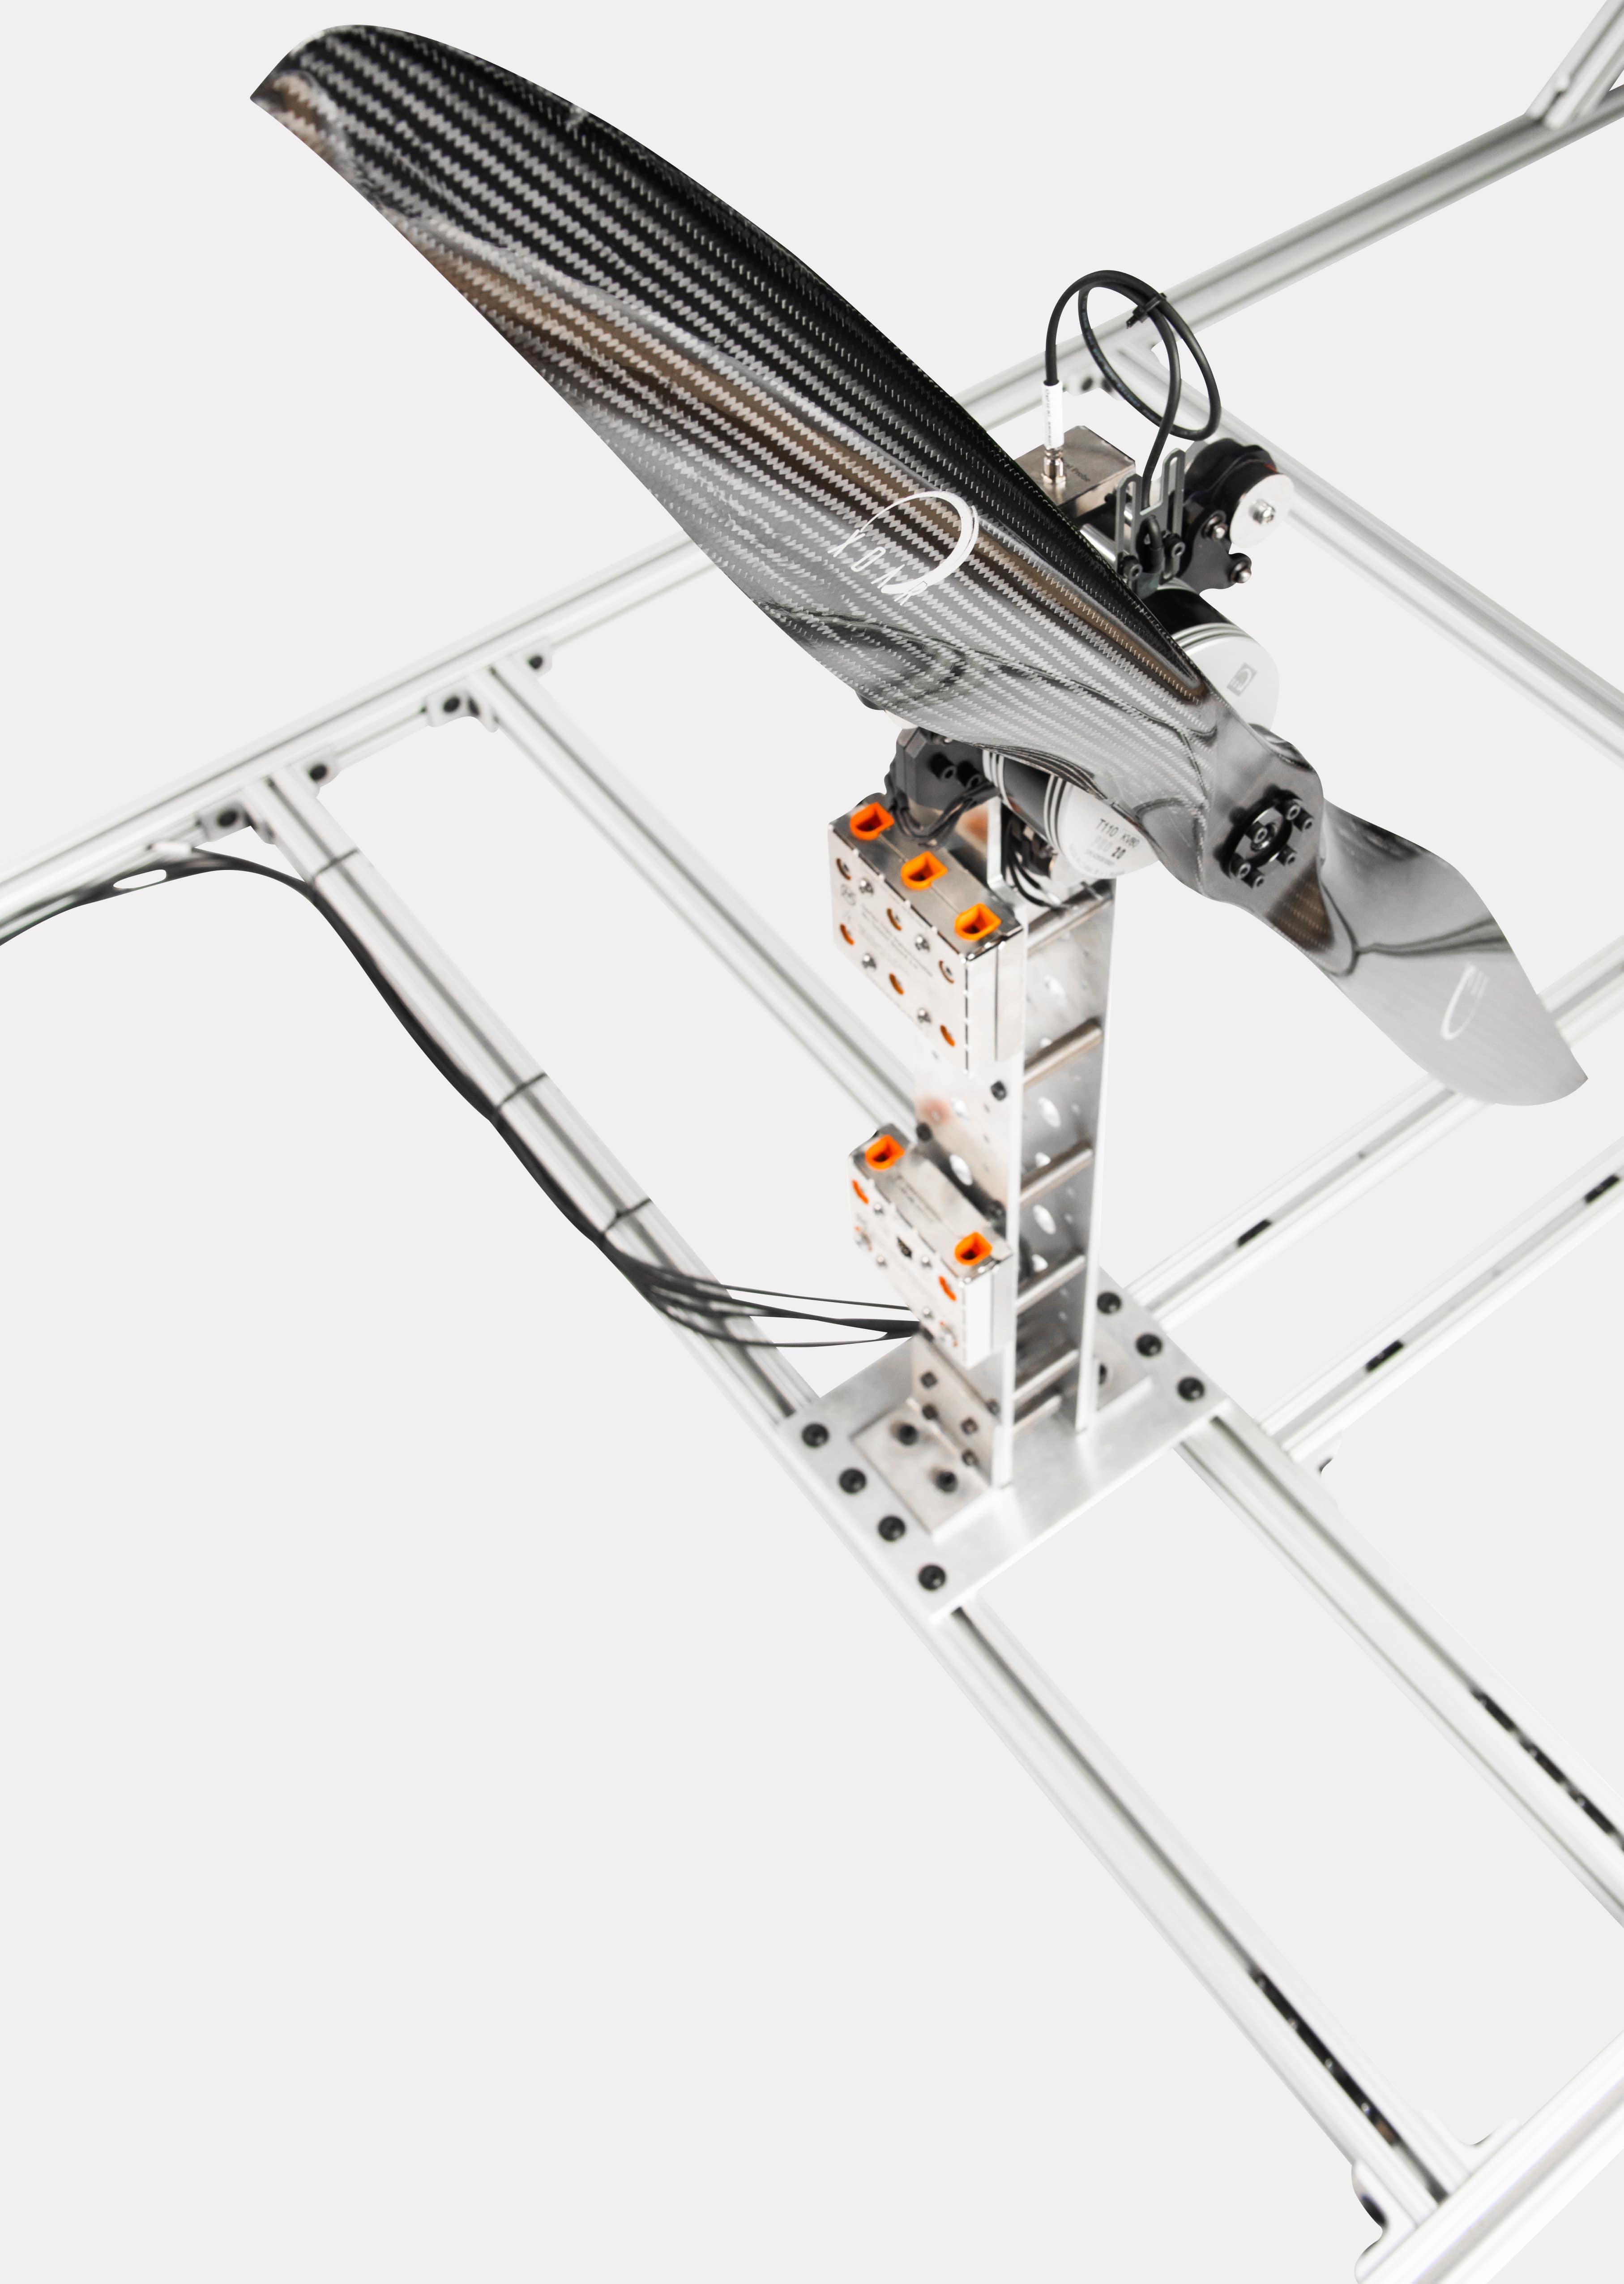 Series 1780 thrust stand